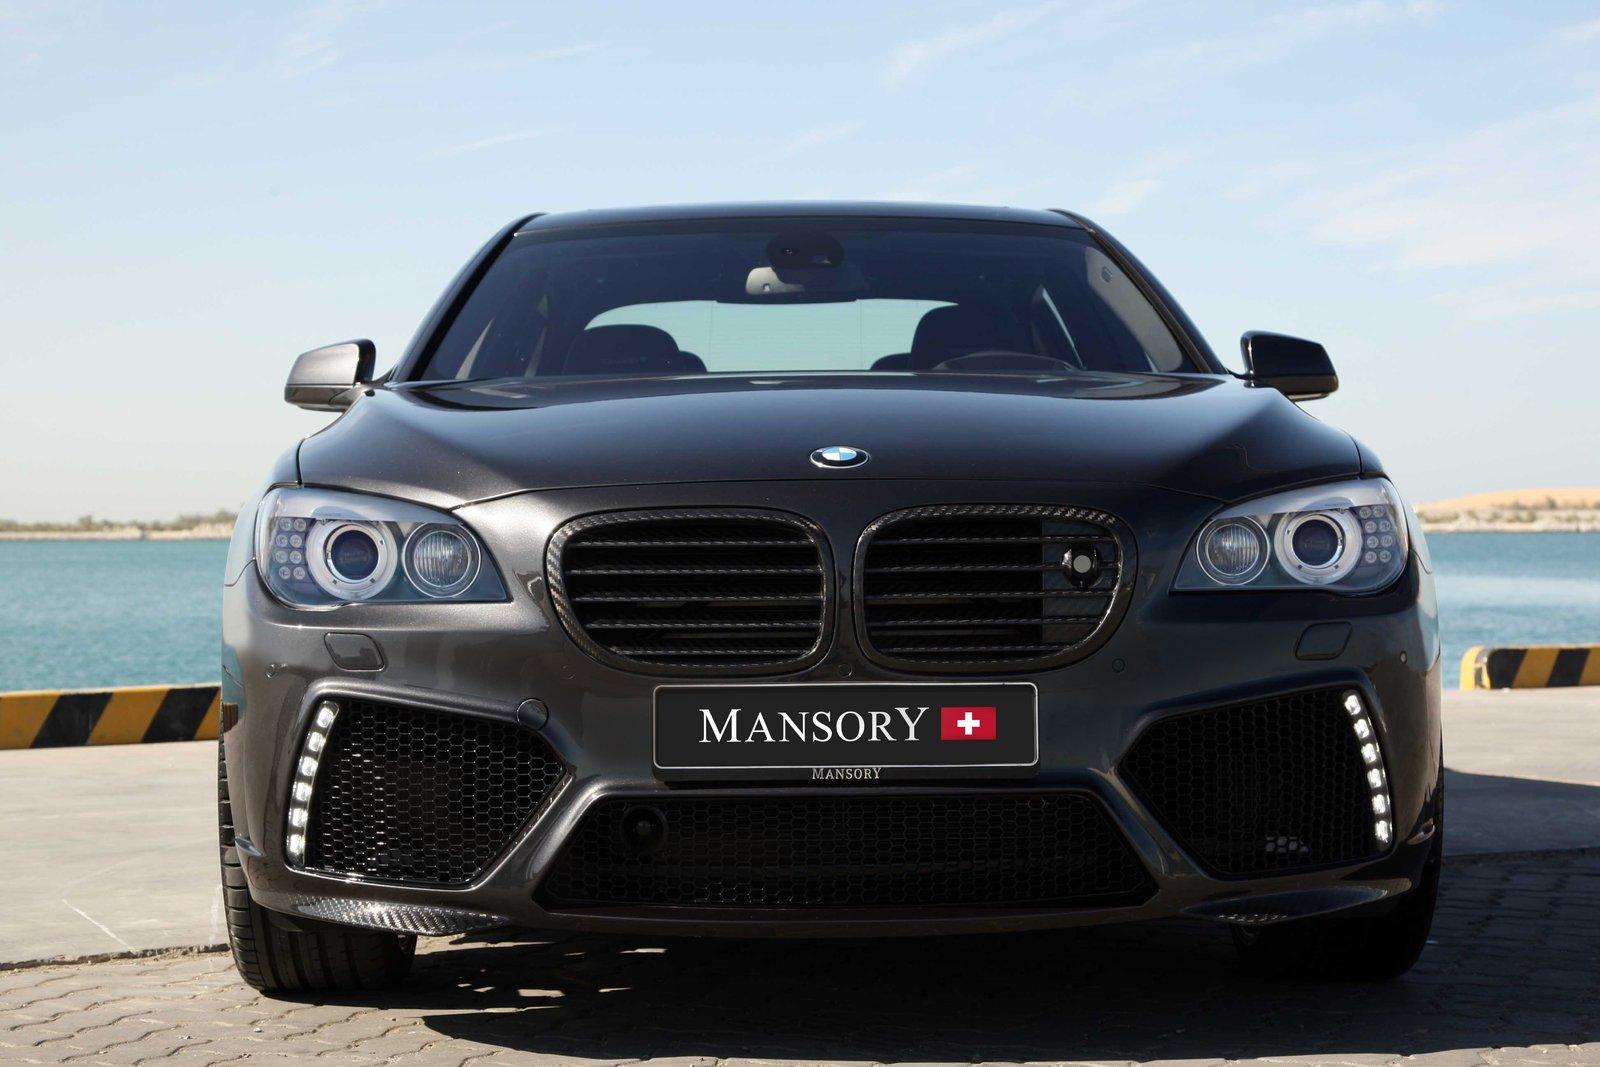 Mansory BMW 7 Series 2011 1540 Fullscreen Wallpapers 800 x 600.